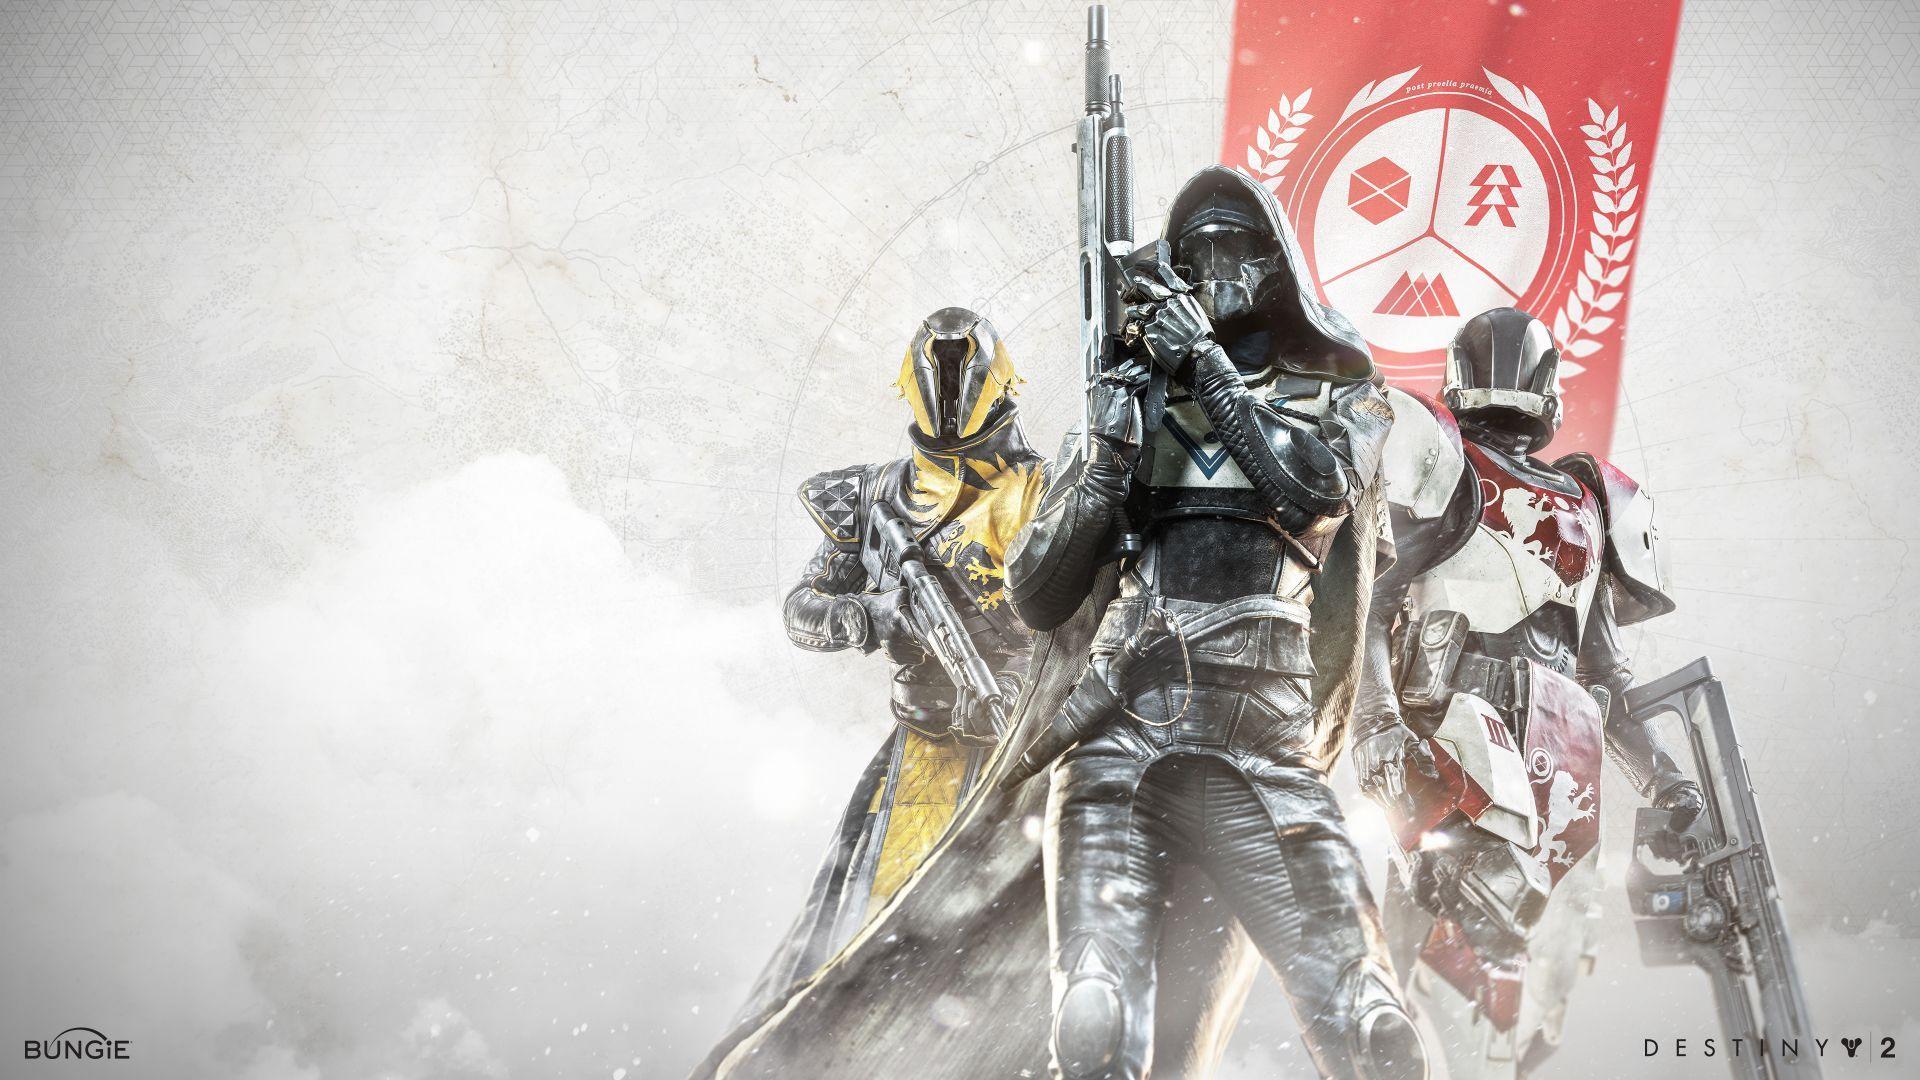 Destiny 2 Warlock Hunter Titan 4k Wallpapers Destiny Hd Wallpaper Wallpaper